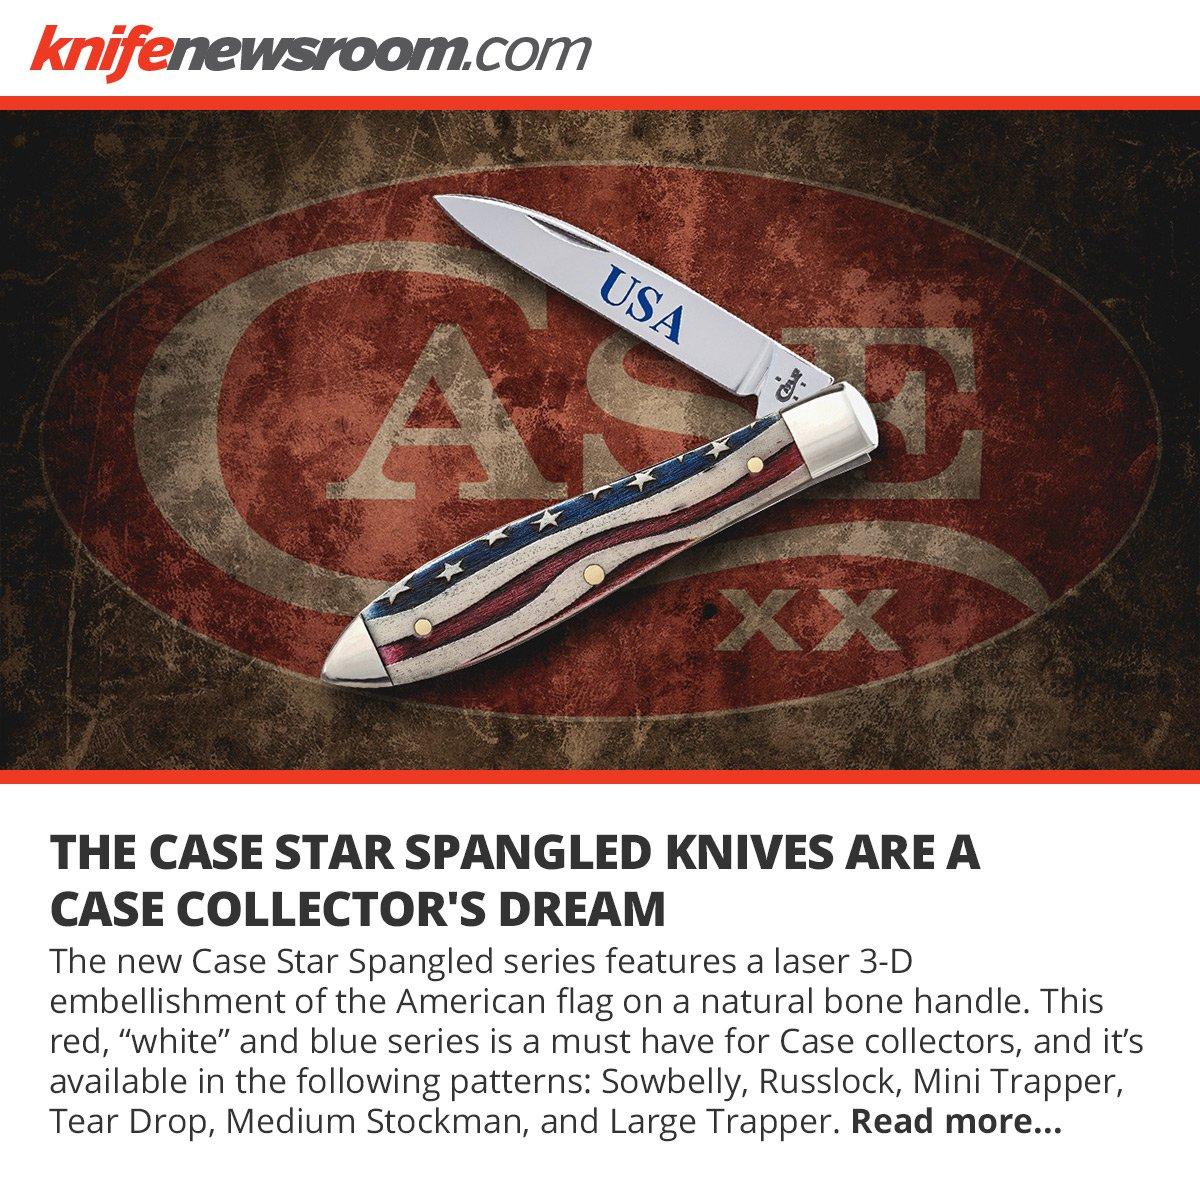 case star spangled at knifenewsroom